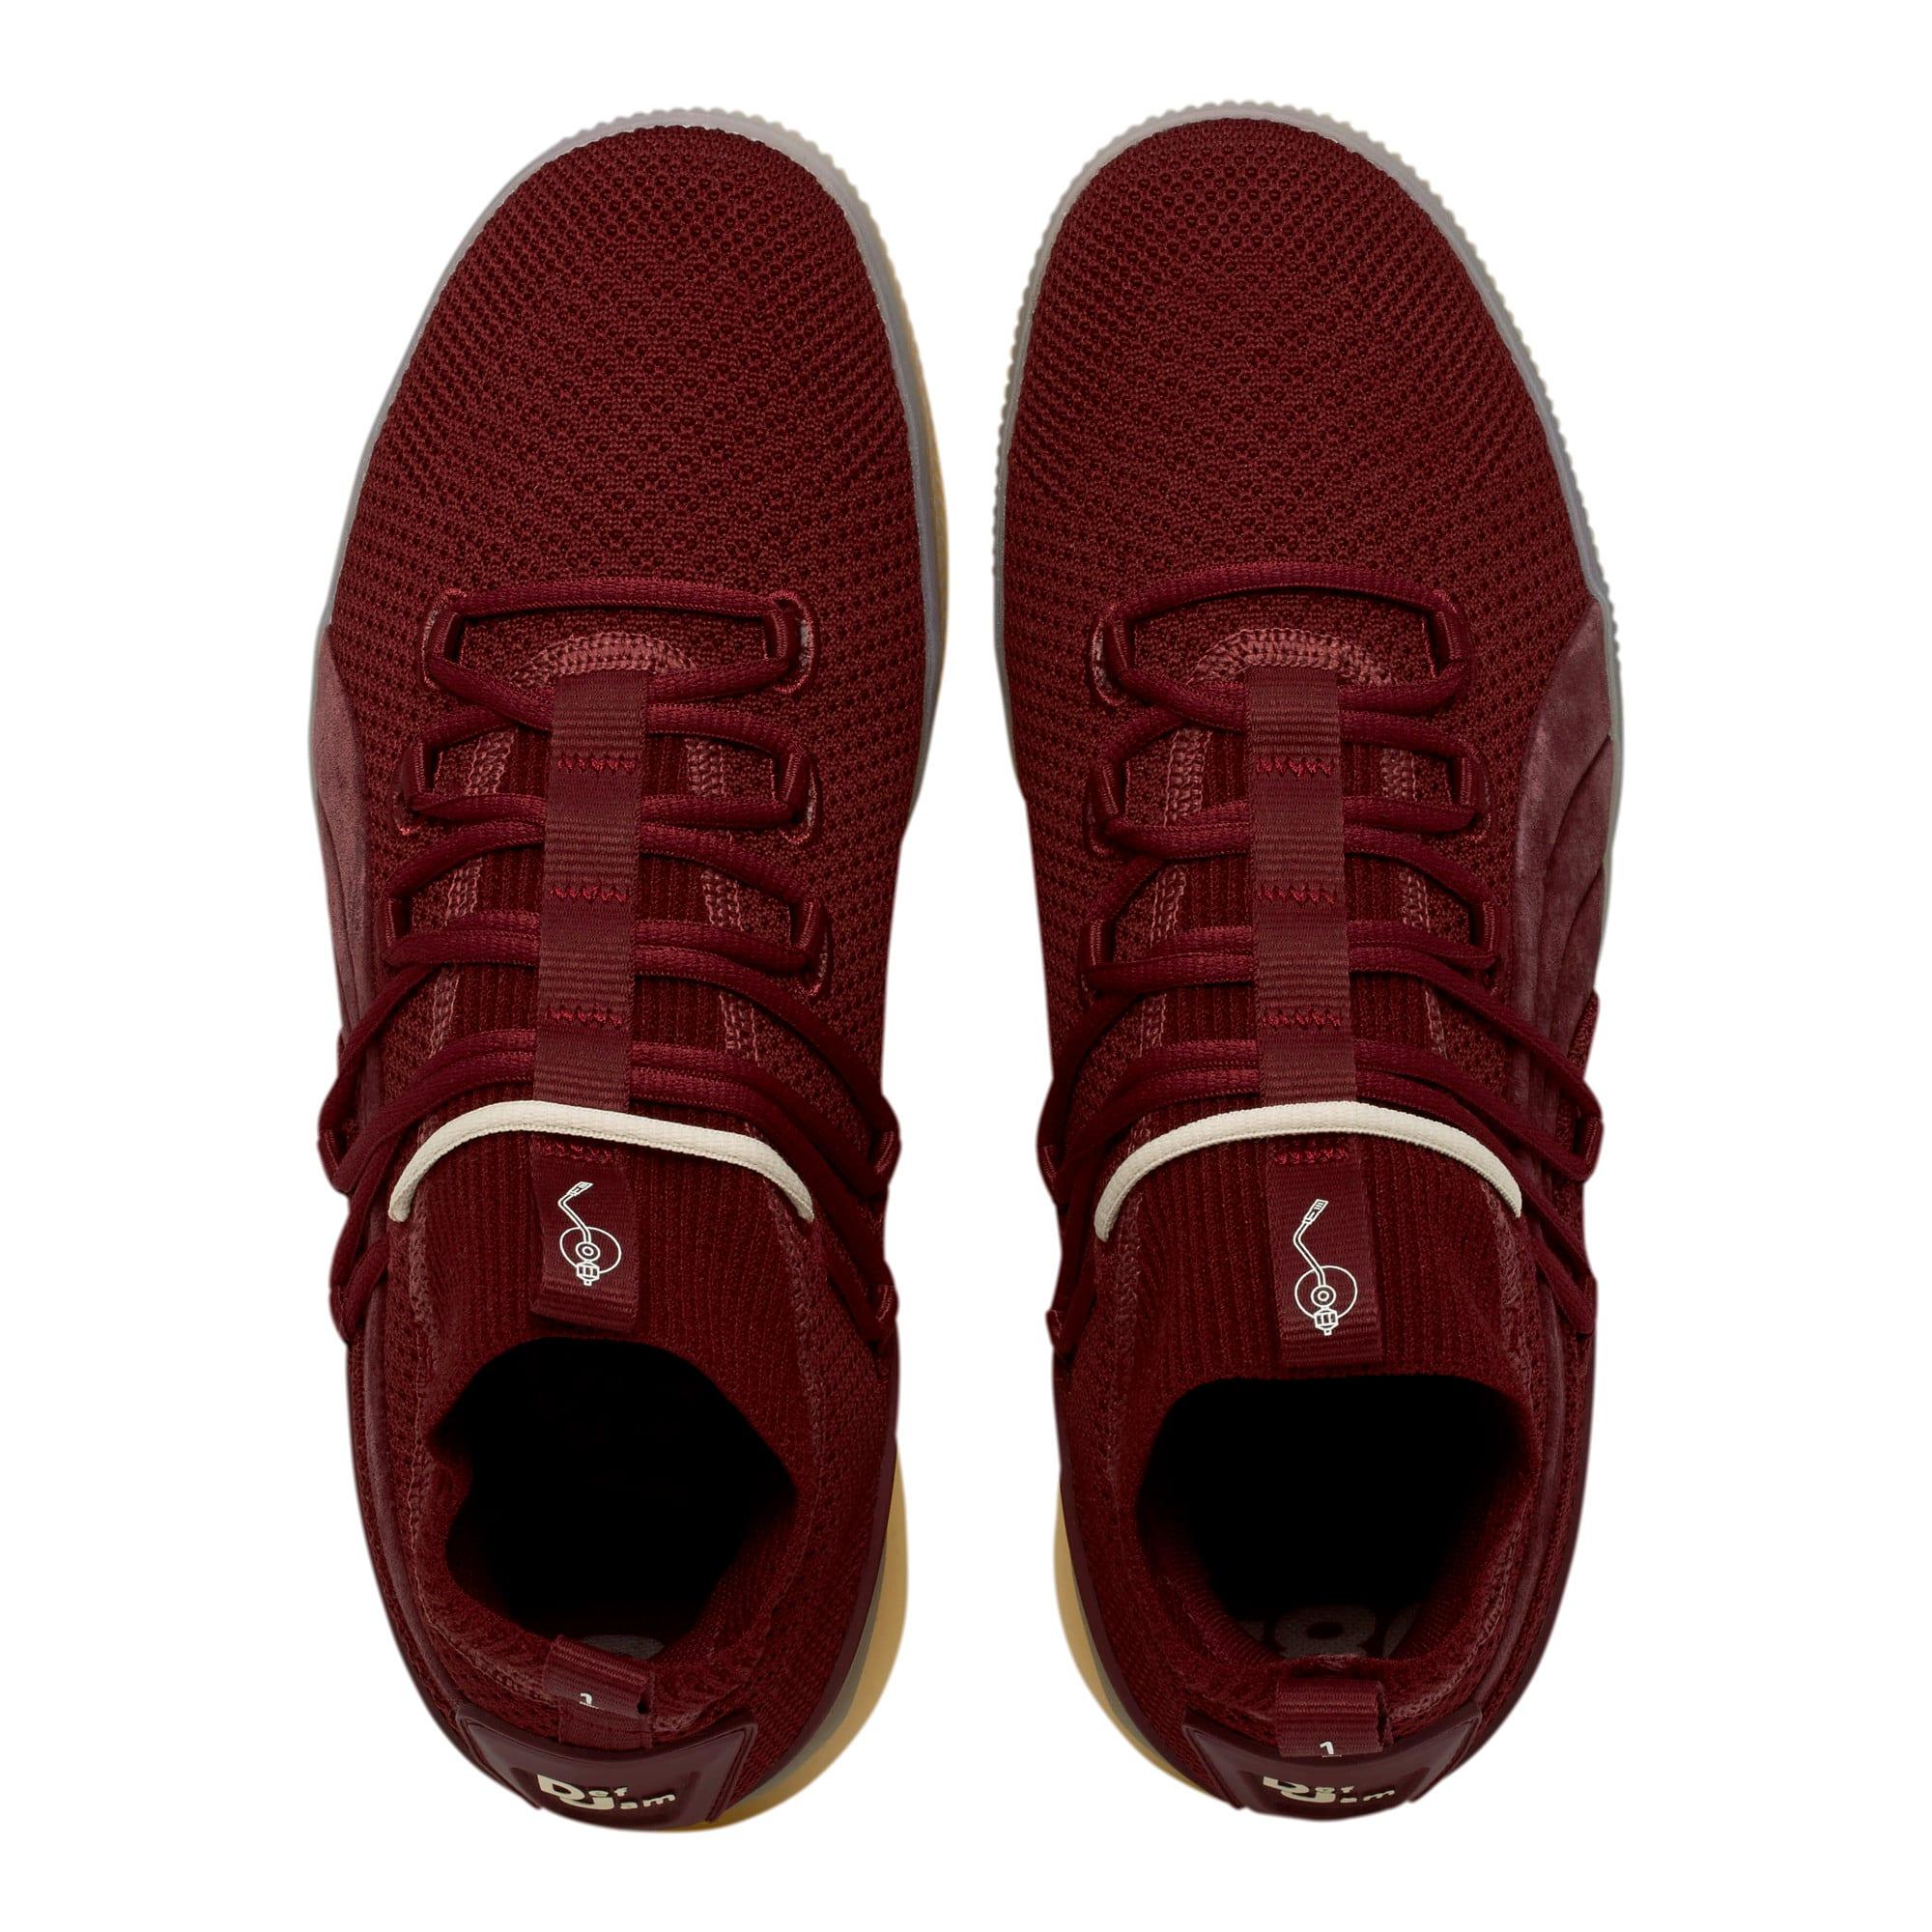 Thumbnail 6 of Clyde Court Def Jam Basketball Shoes, Cordovan, medium